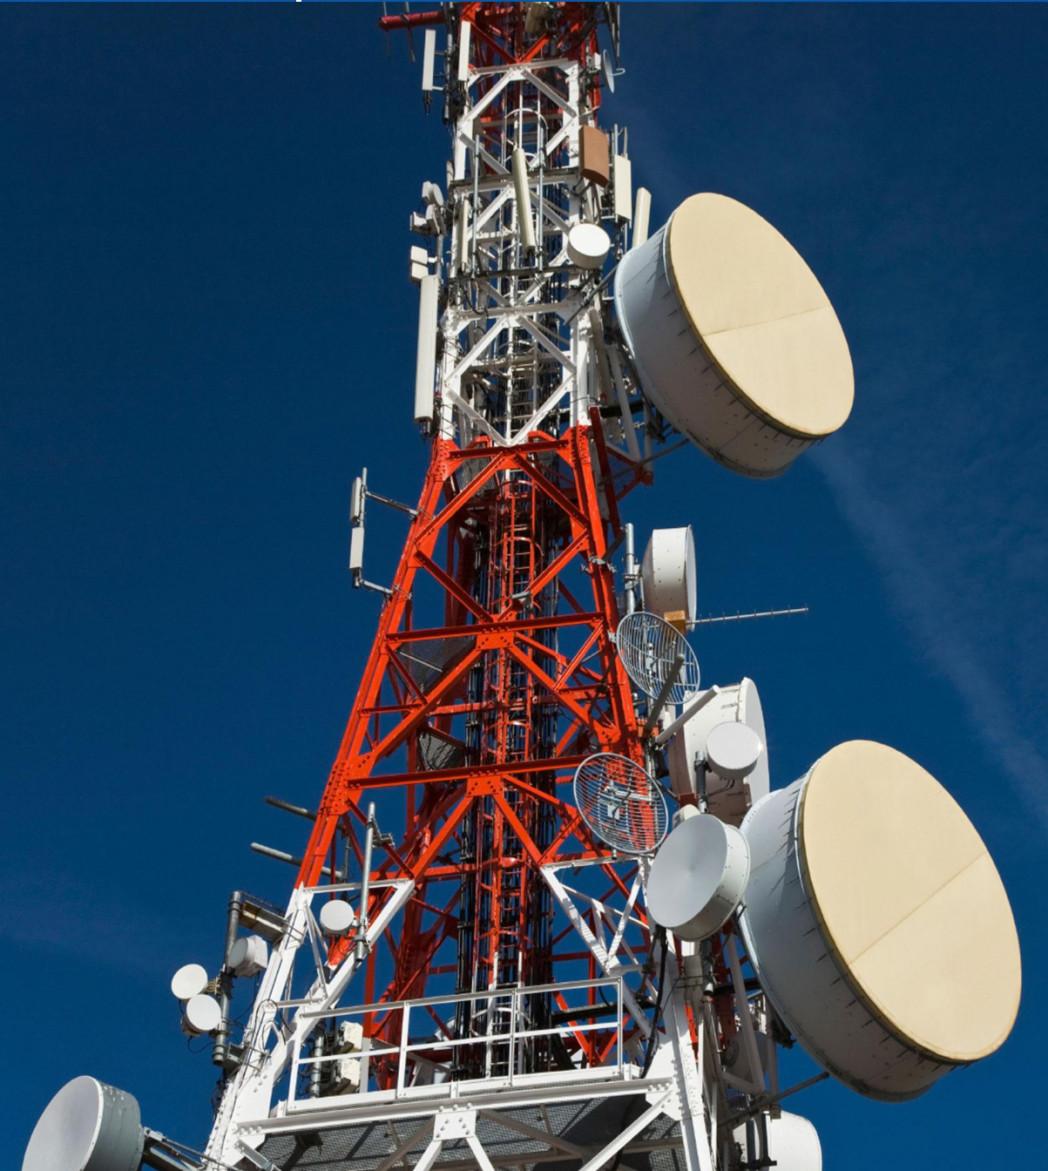 Nigeria's-telcom-InterC-Network-targets-million-customers